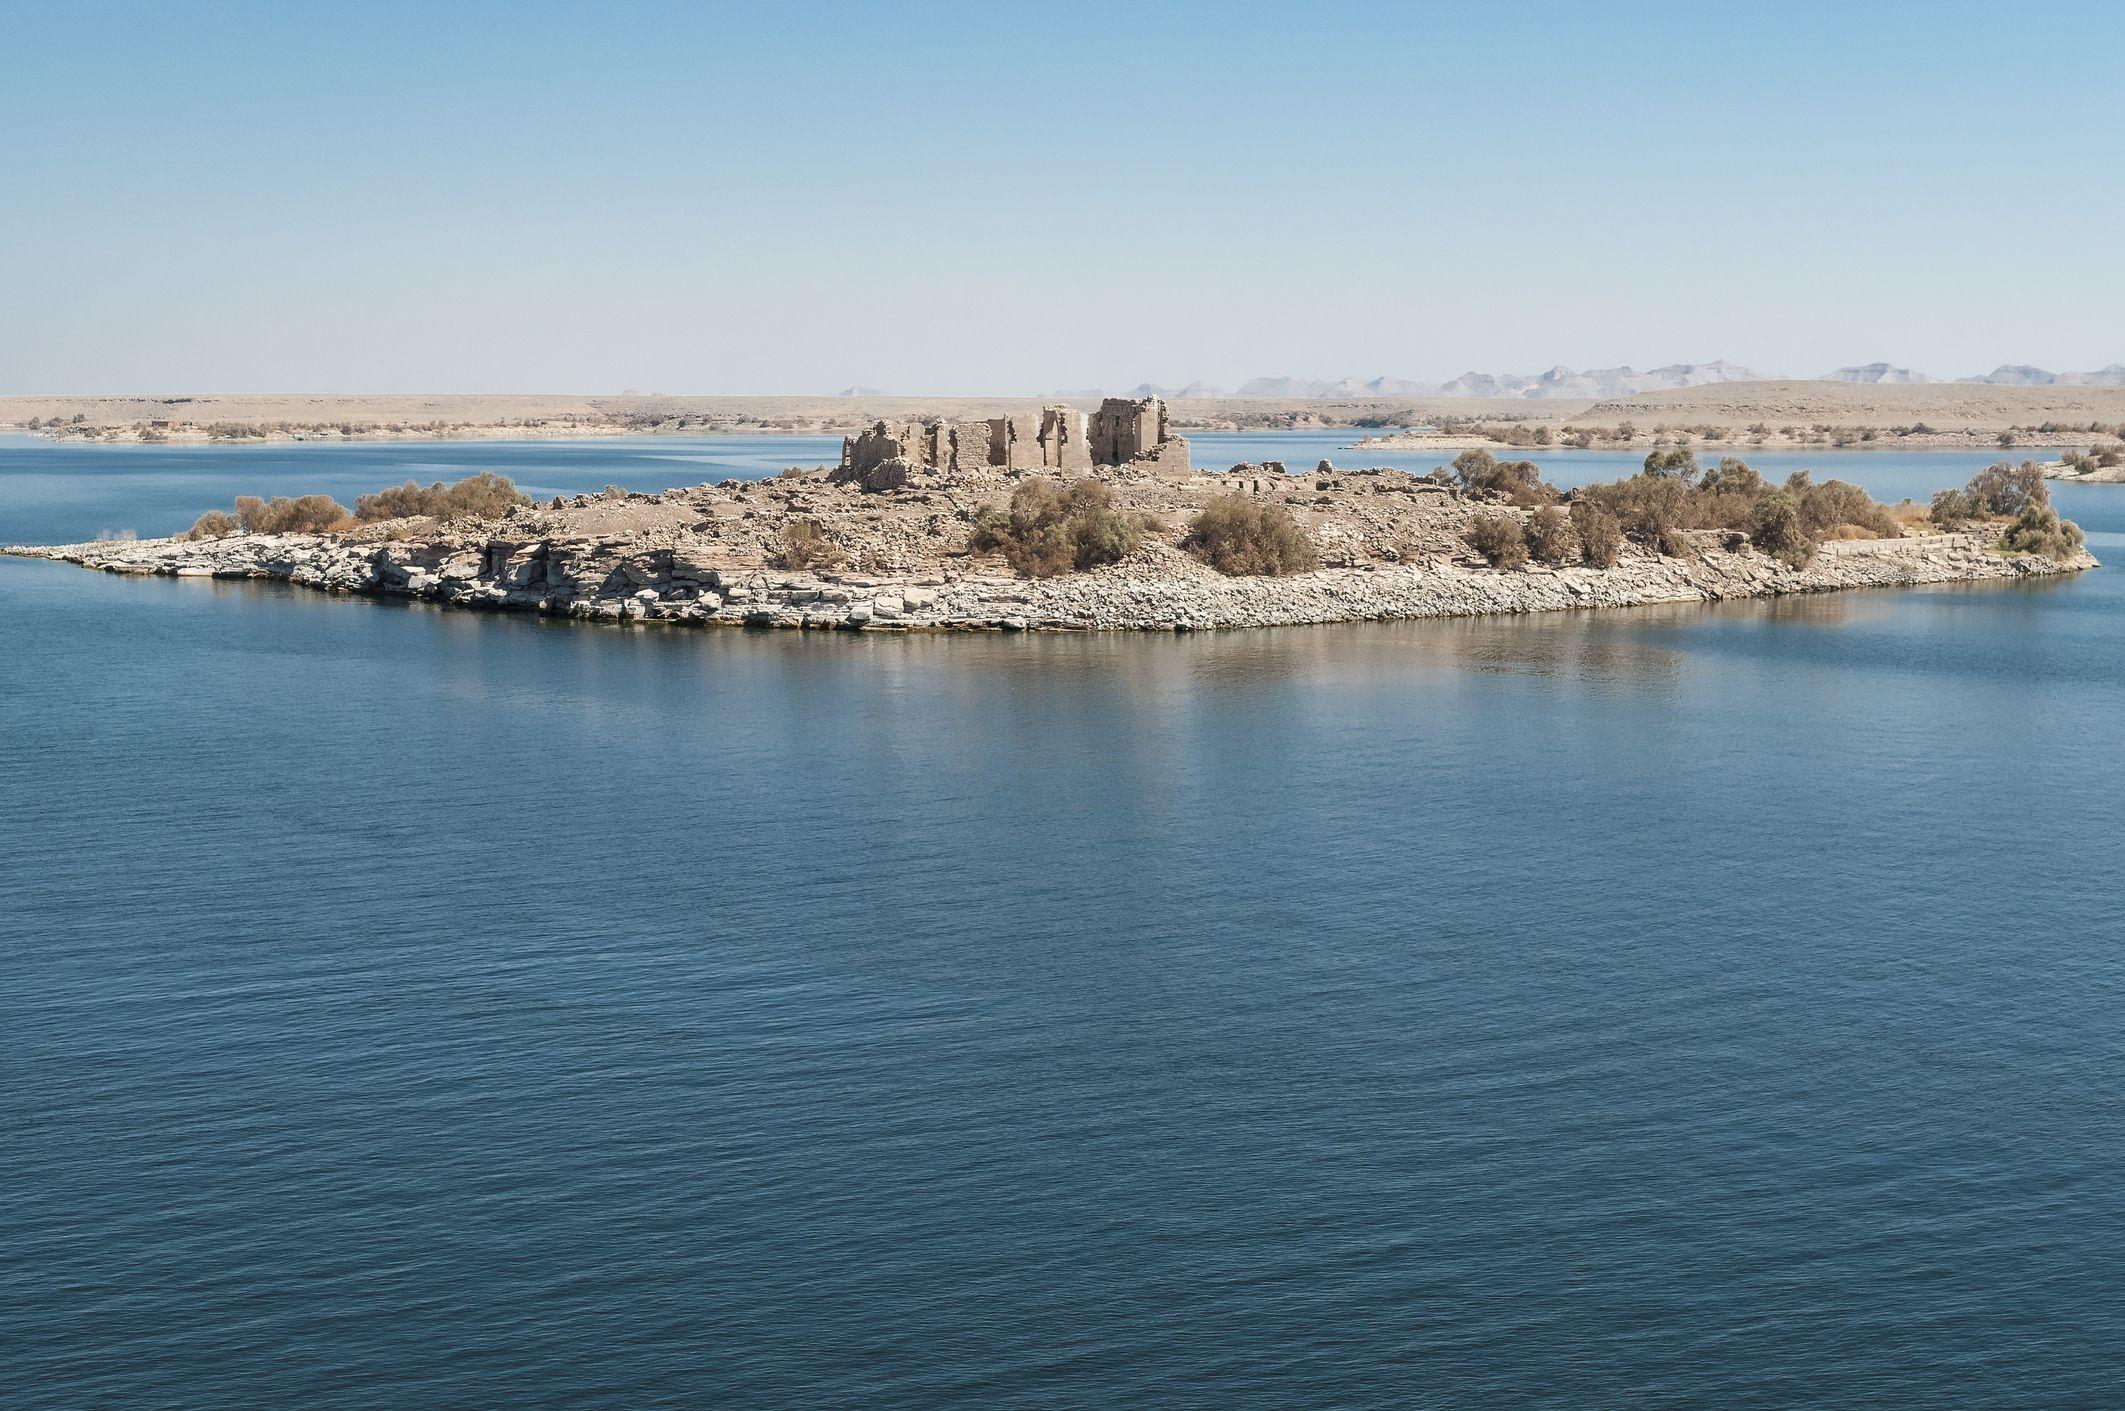 Lake Nasser, Egypt: The Complete Guide